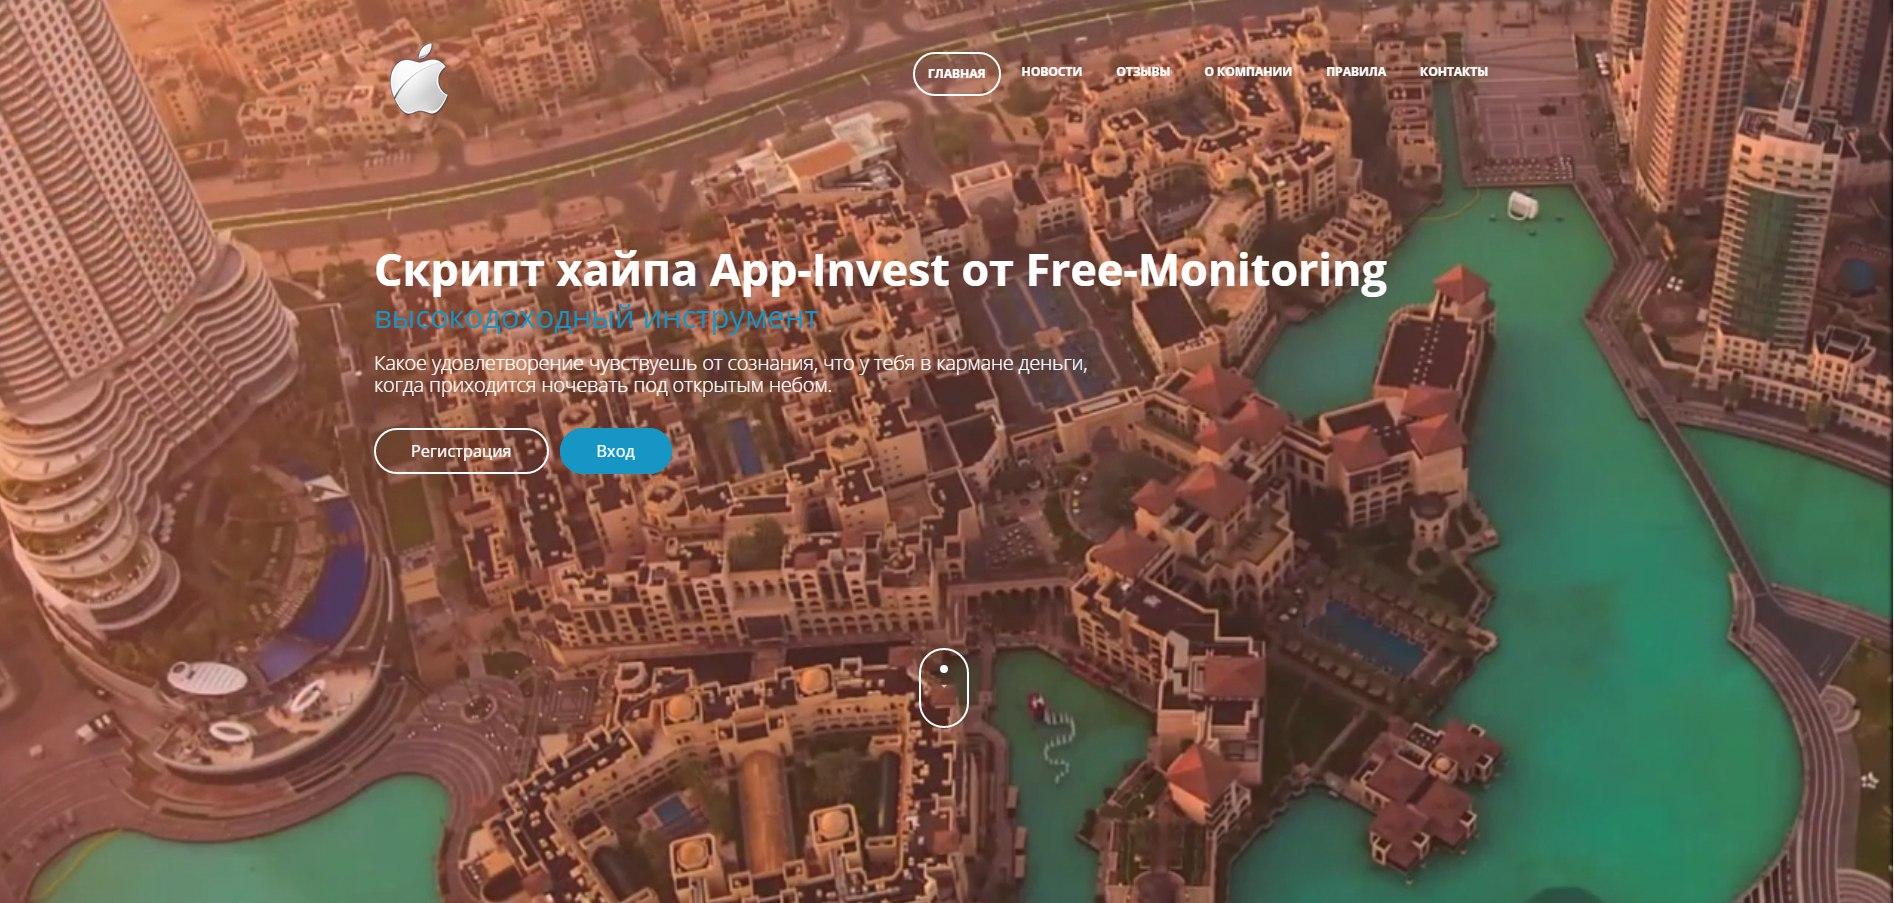 Скрипт хайпа App-Invest